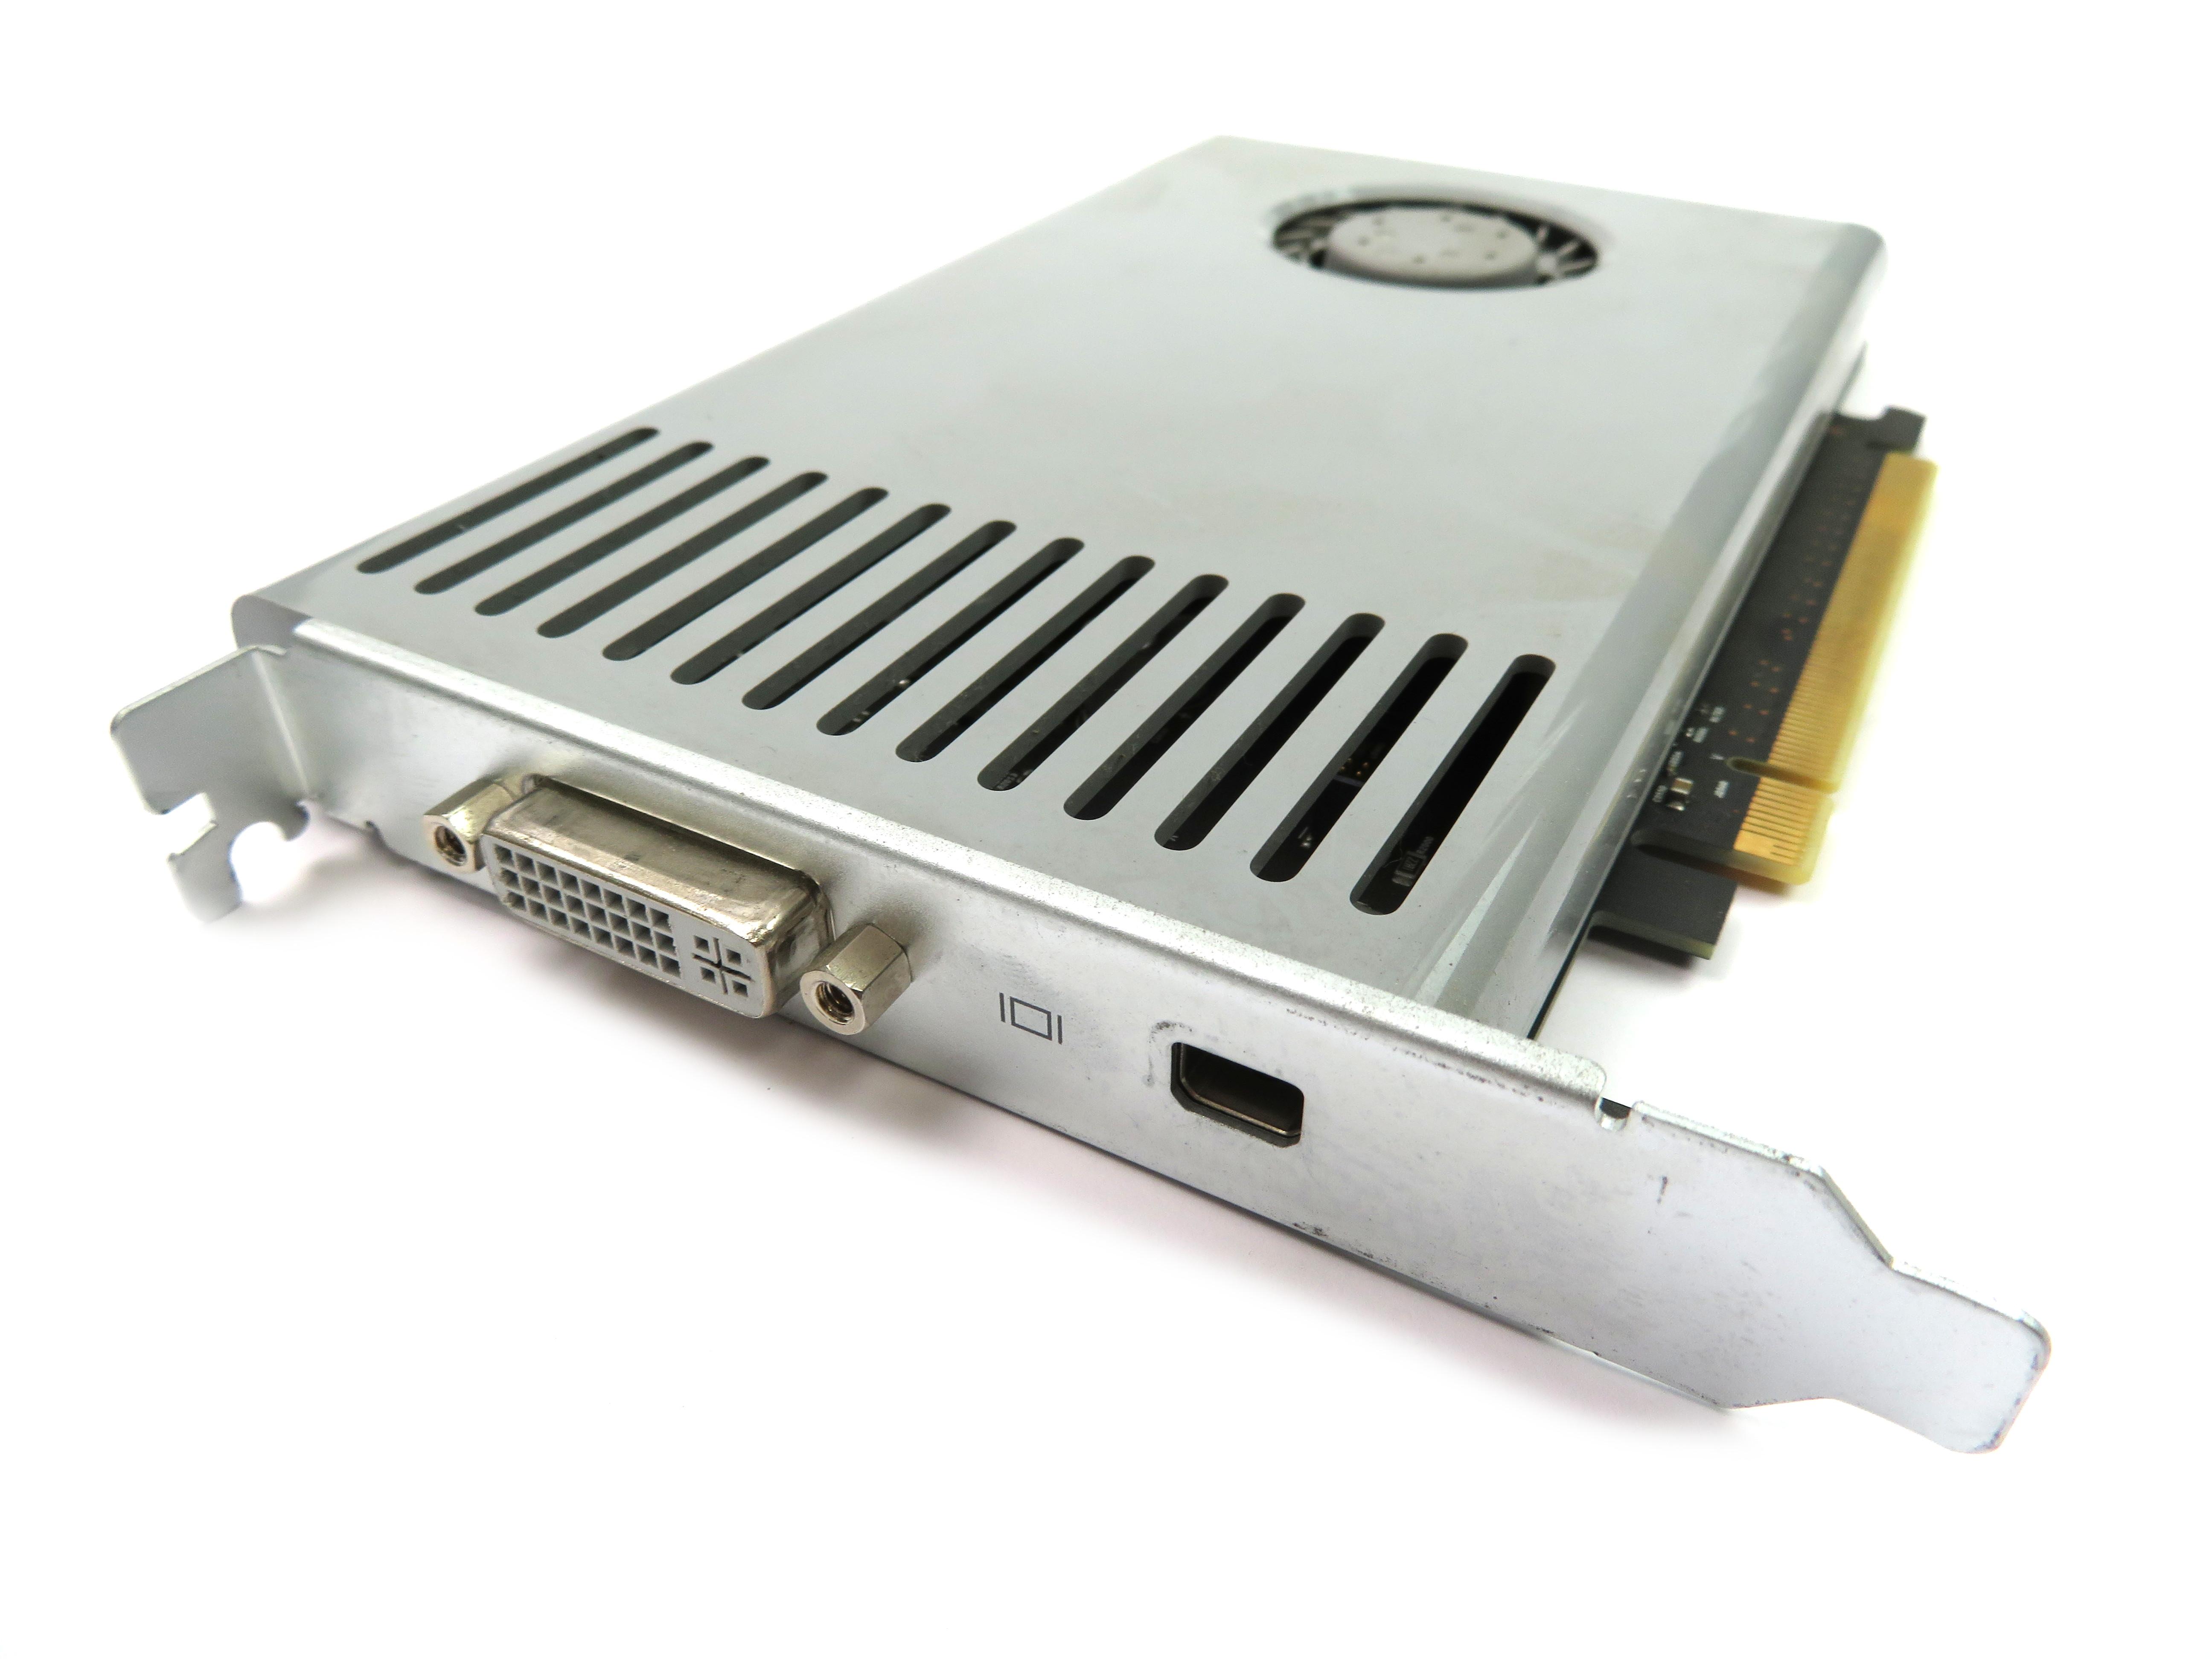 Apple 639-0376 NVIDIA GeForce GT120 512MB Graphics Card /f Mac Pro  (2008-2012)